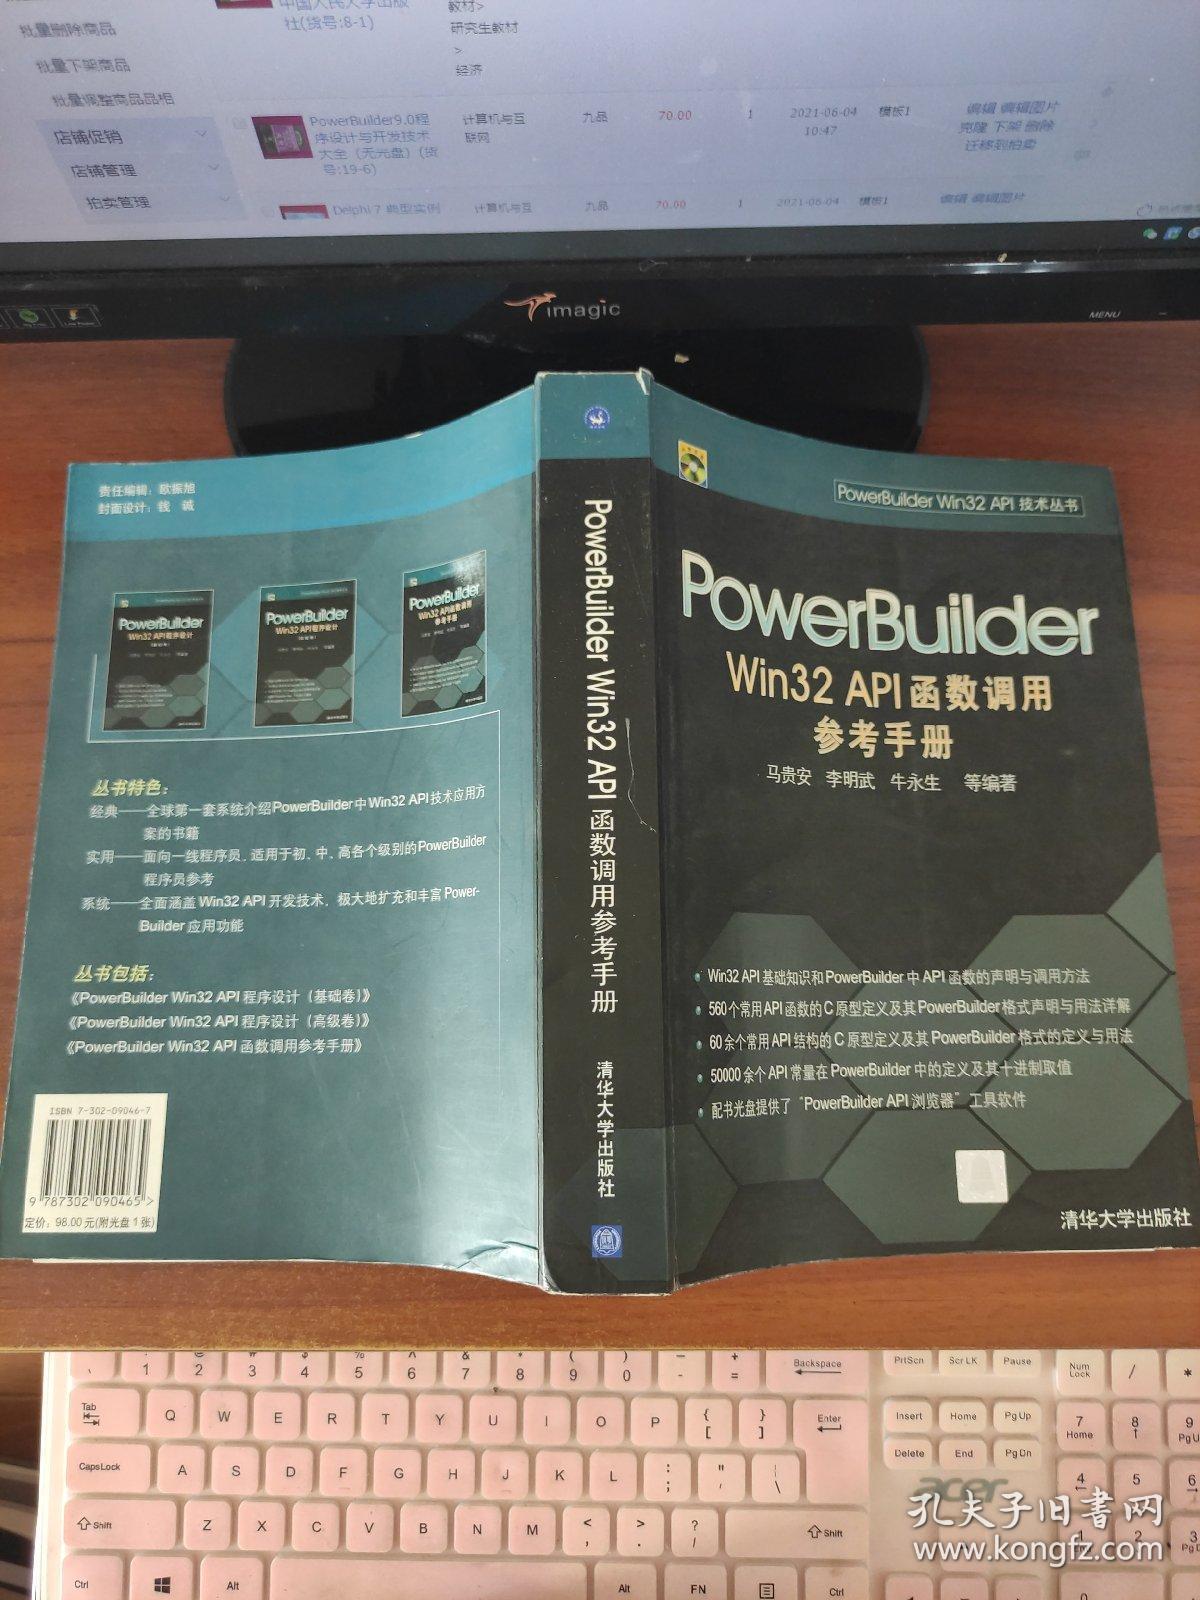 PowerBuilder Win32 API函数调用参考手册 马贵安  编著 清华大学出版社